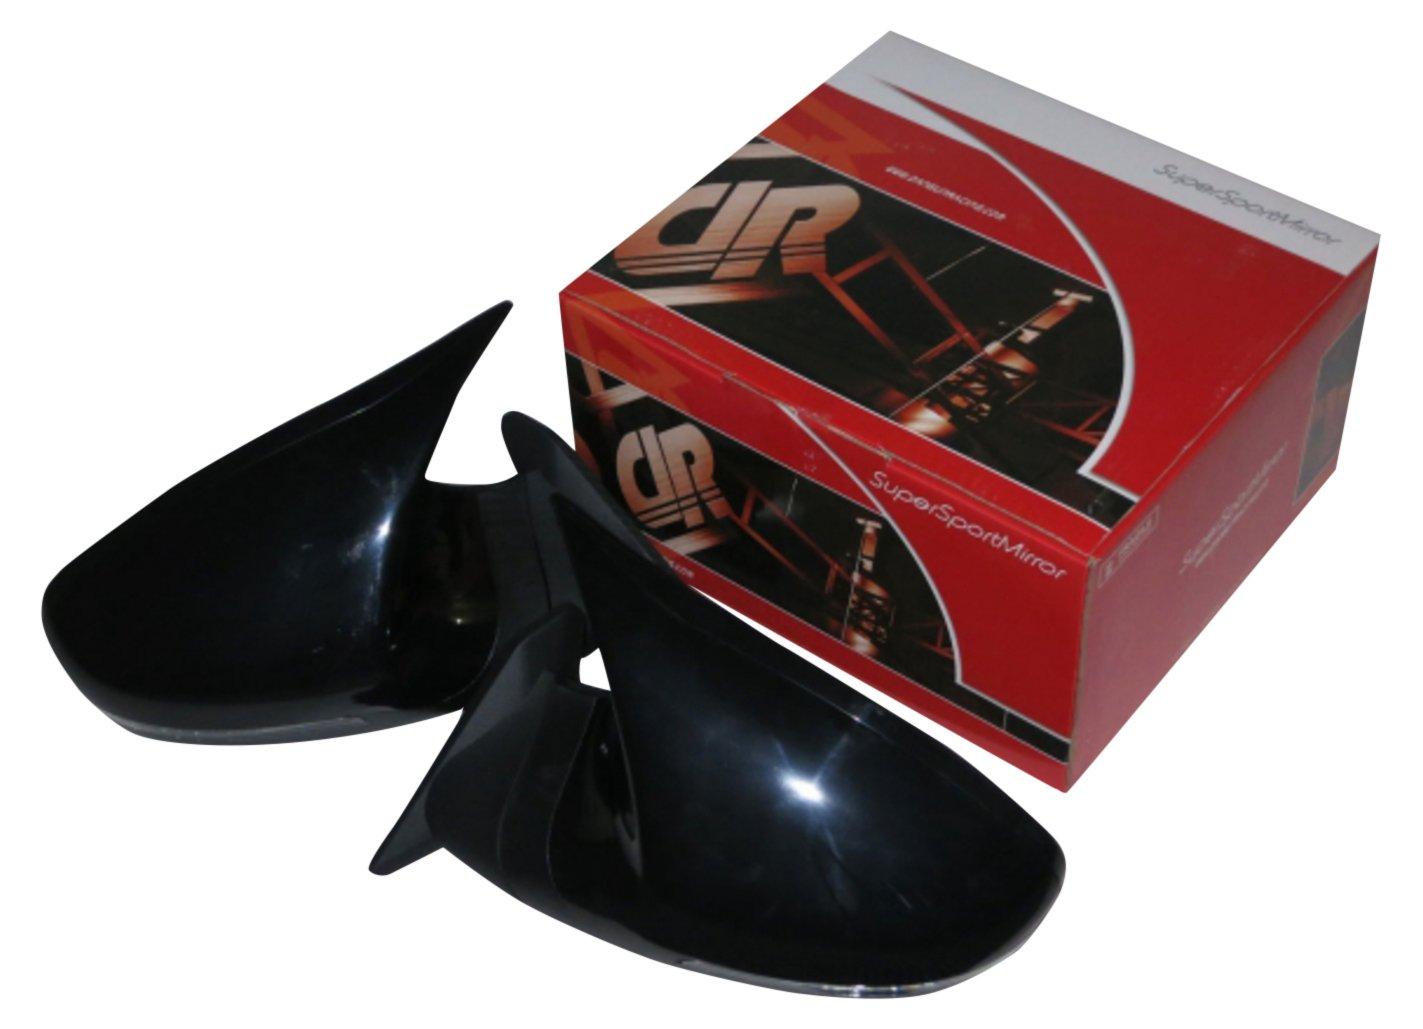 GTSミラー LED ブラック 電動格納 ミラー面電動調整 右ハンドル 日産 ティアナ J31系 [2003~2008] SBMGTSBKAALHR-1413 B075S7Y35C 日産 ティアナ J31系 [2003~2008]|ブラック ブラック 日産 ティアナ J31系 [2003~2008]